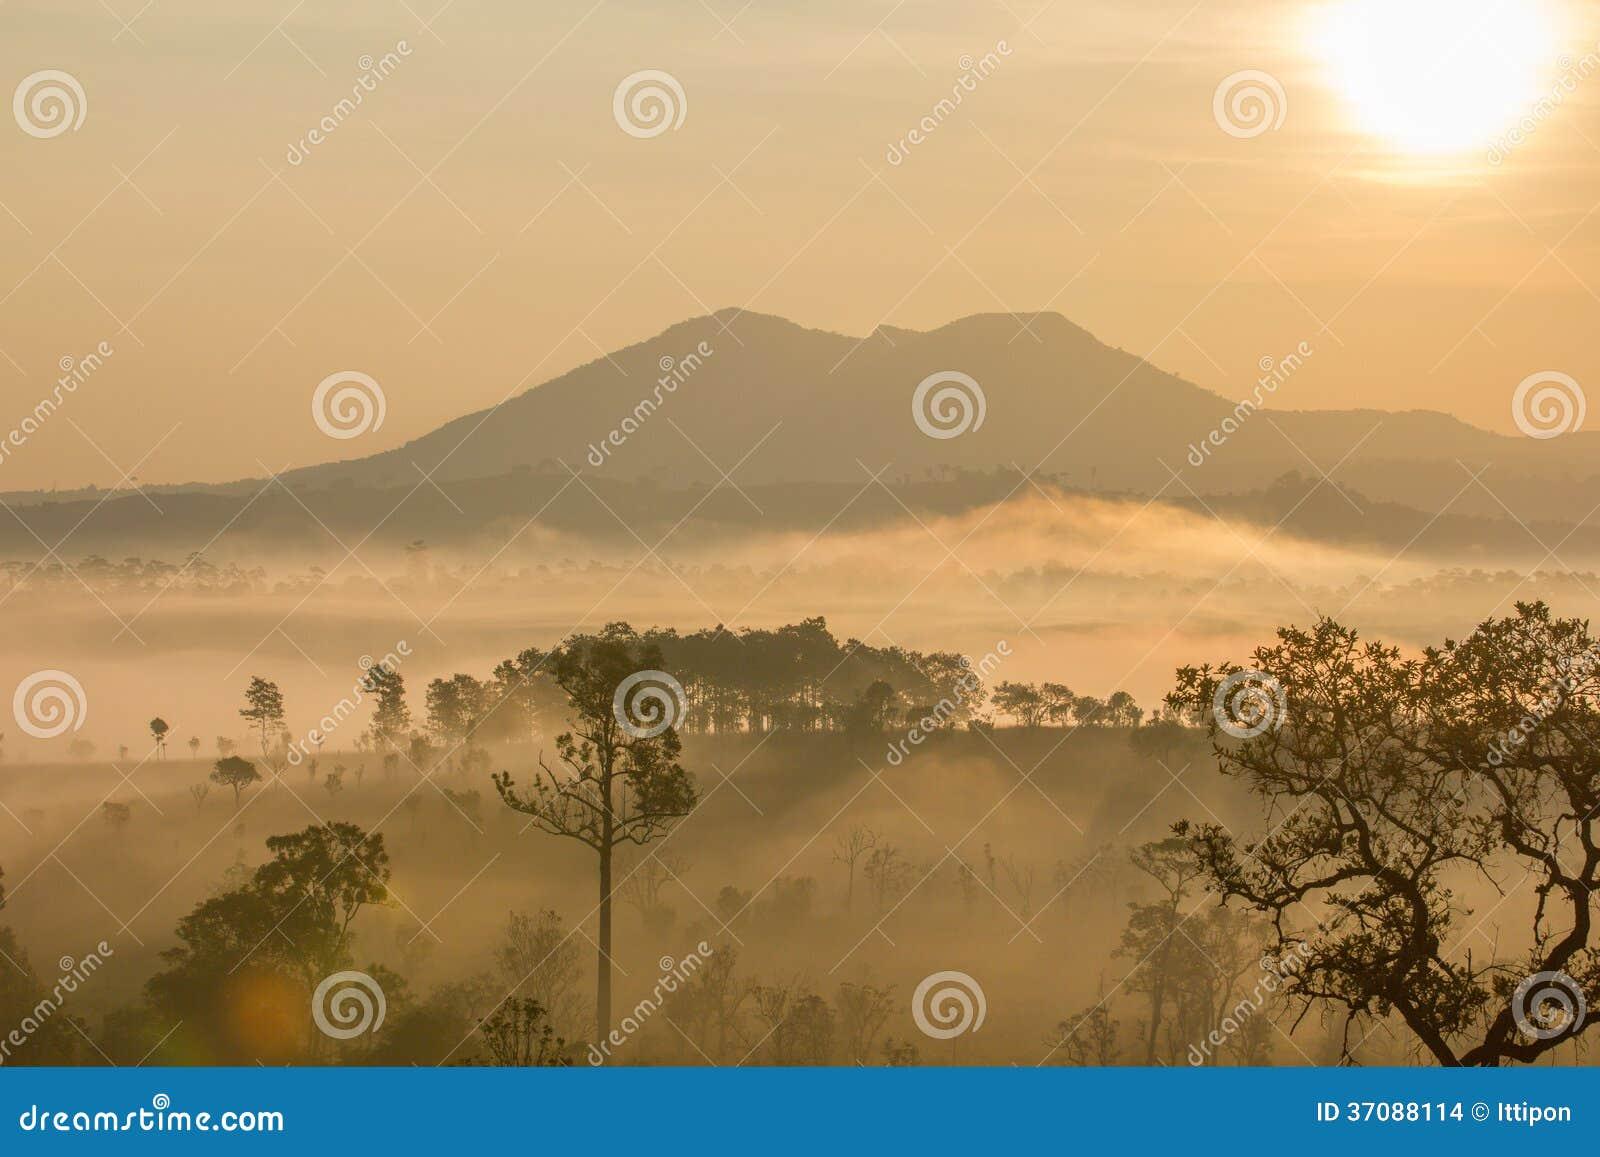 Sun-mountain-beautiful-nature-37088114